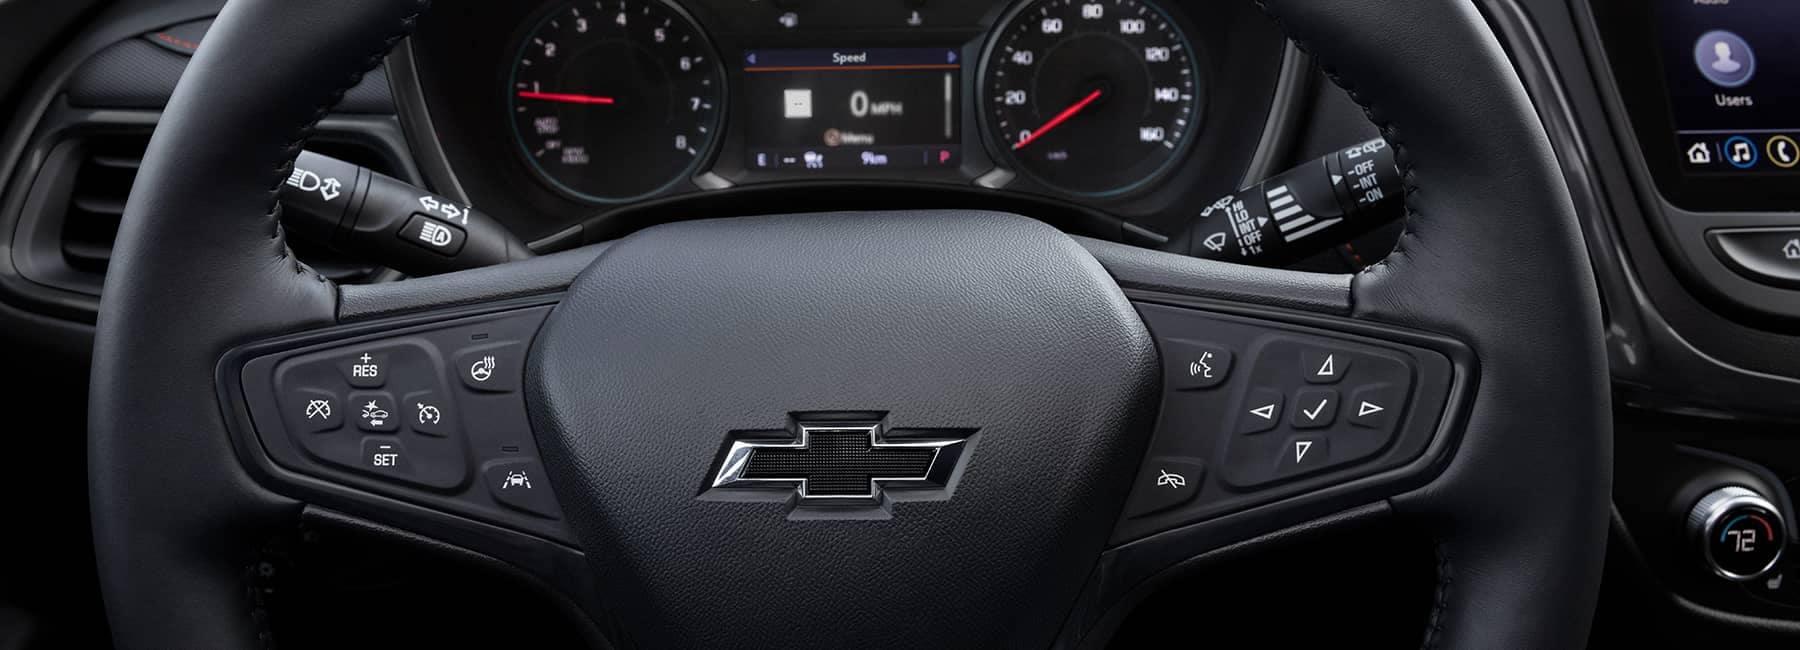 2021 Chevrolet Equinox Steering Wheel (1)